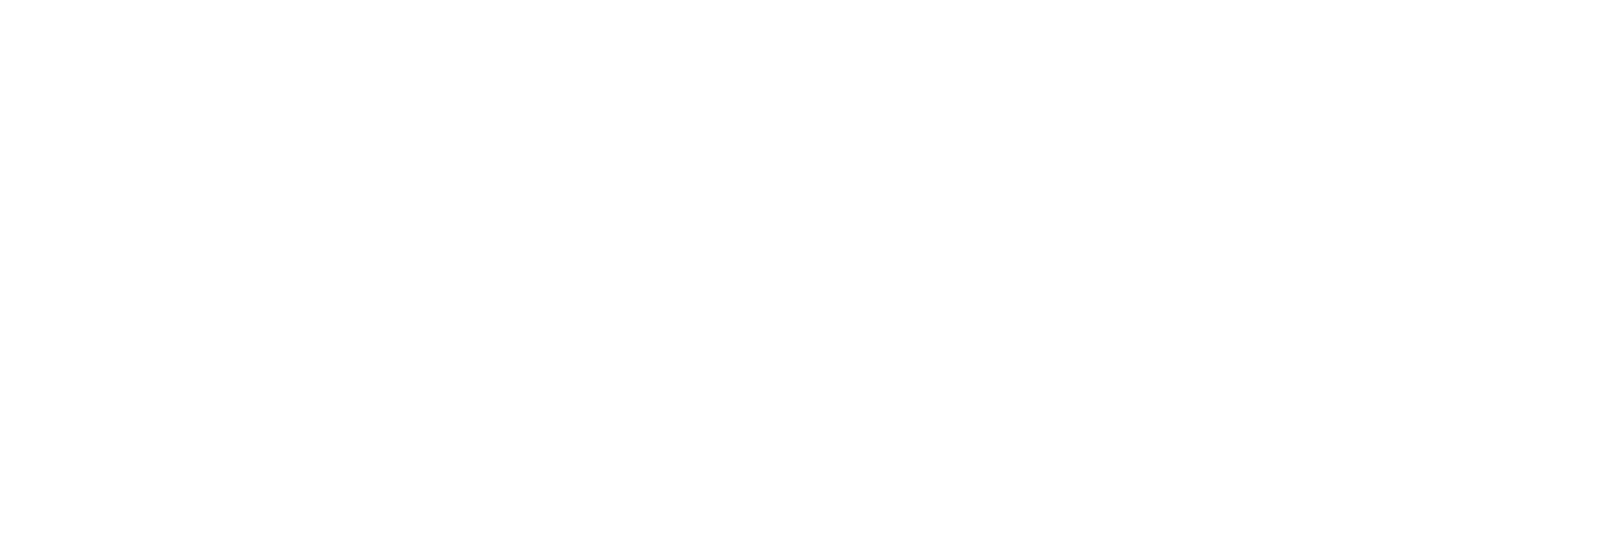 Blank-Foreground